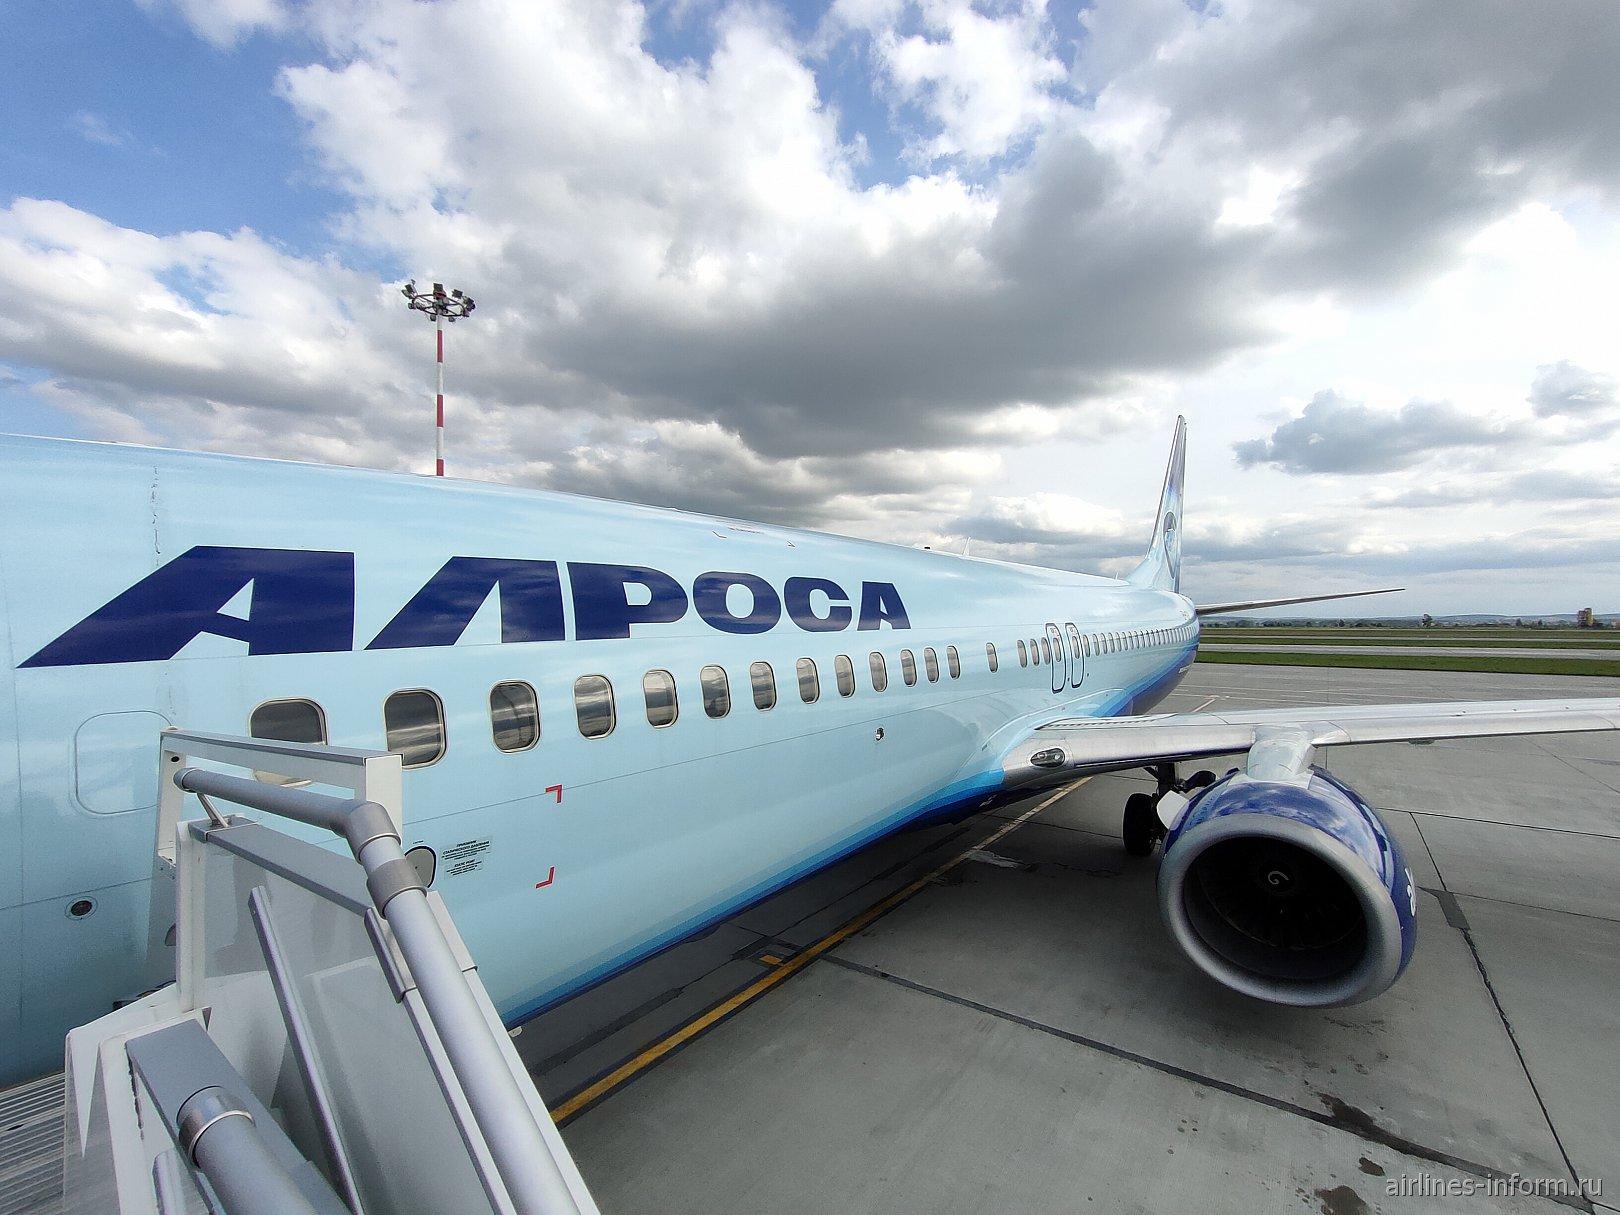 Екатеринбург - Домодедово, авиакомпания Алроса на Boeing 737-800